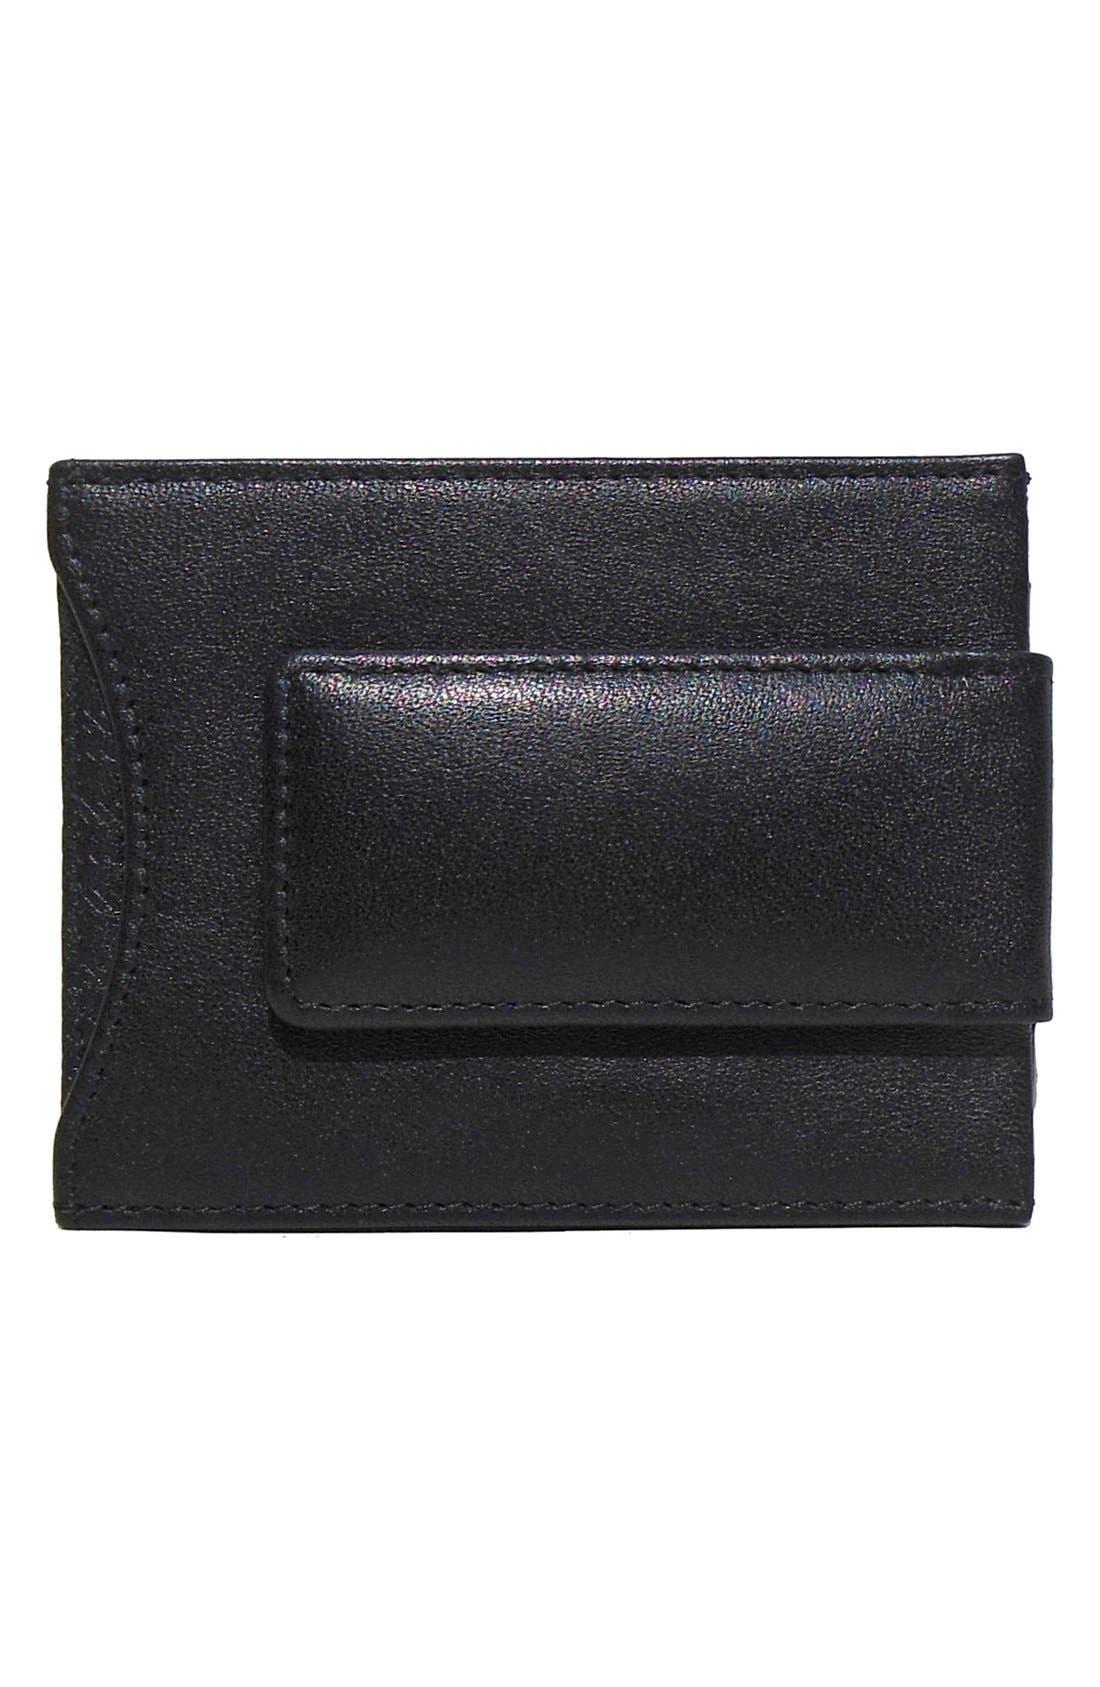 'Grant' Money Clip Card Case,                             Alternate thumbnail 2, color,                             BLACK/ GREY